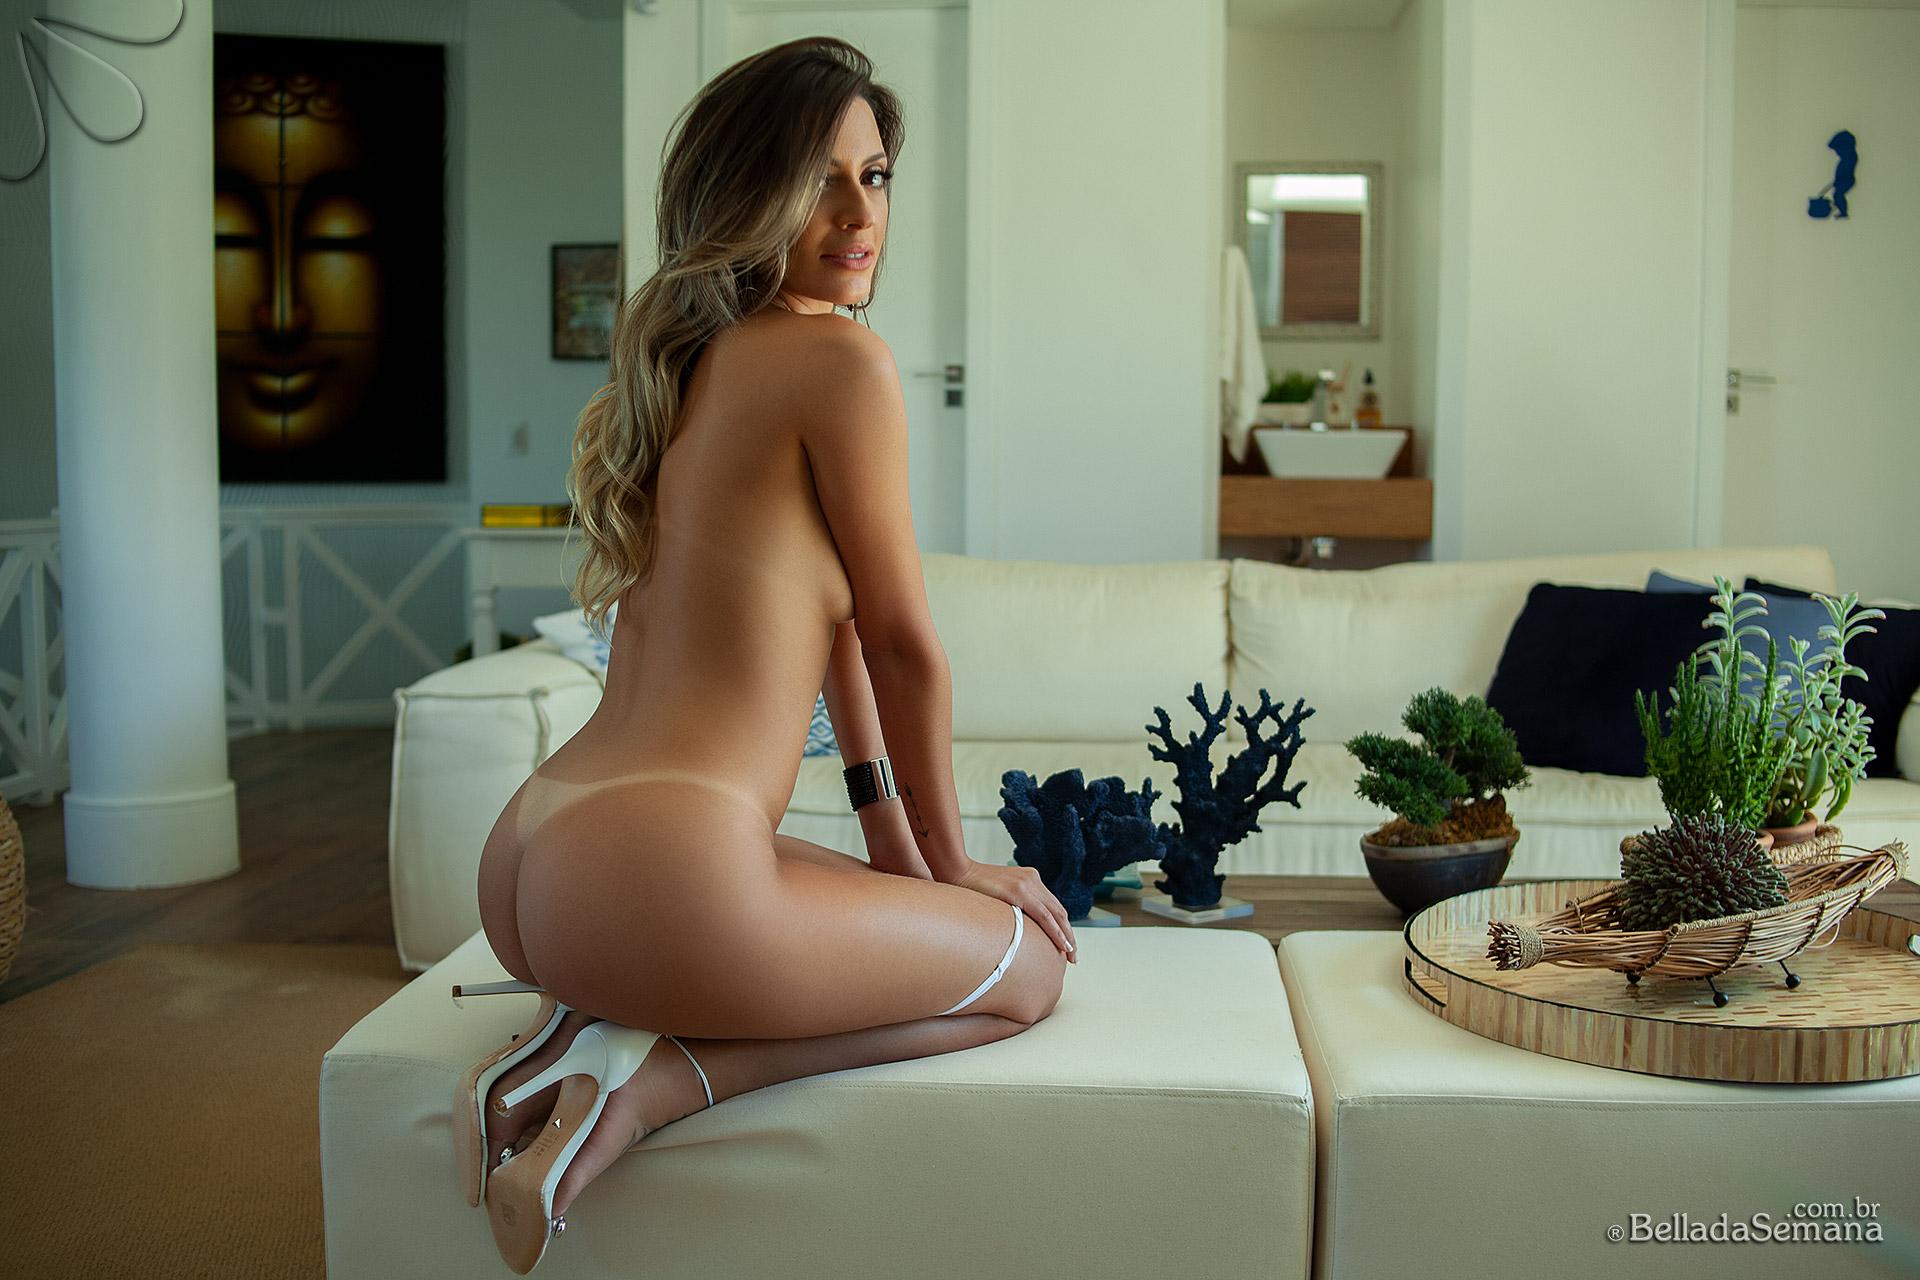 Luanna Lodi - bella da semana